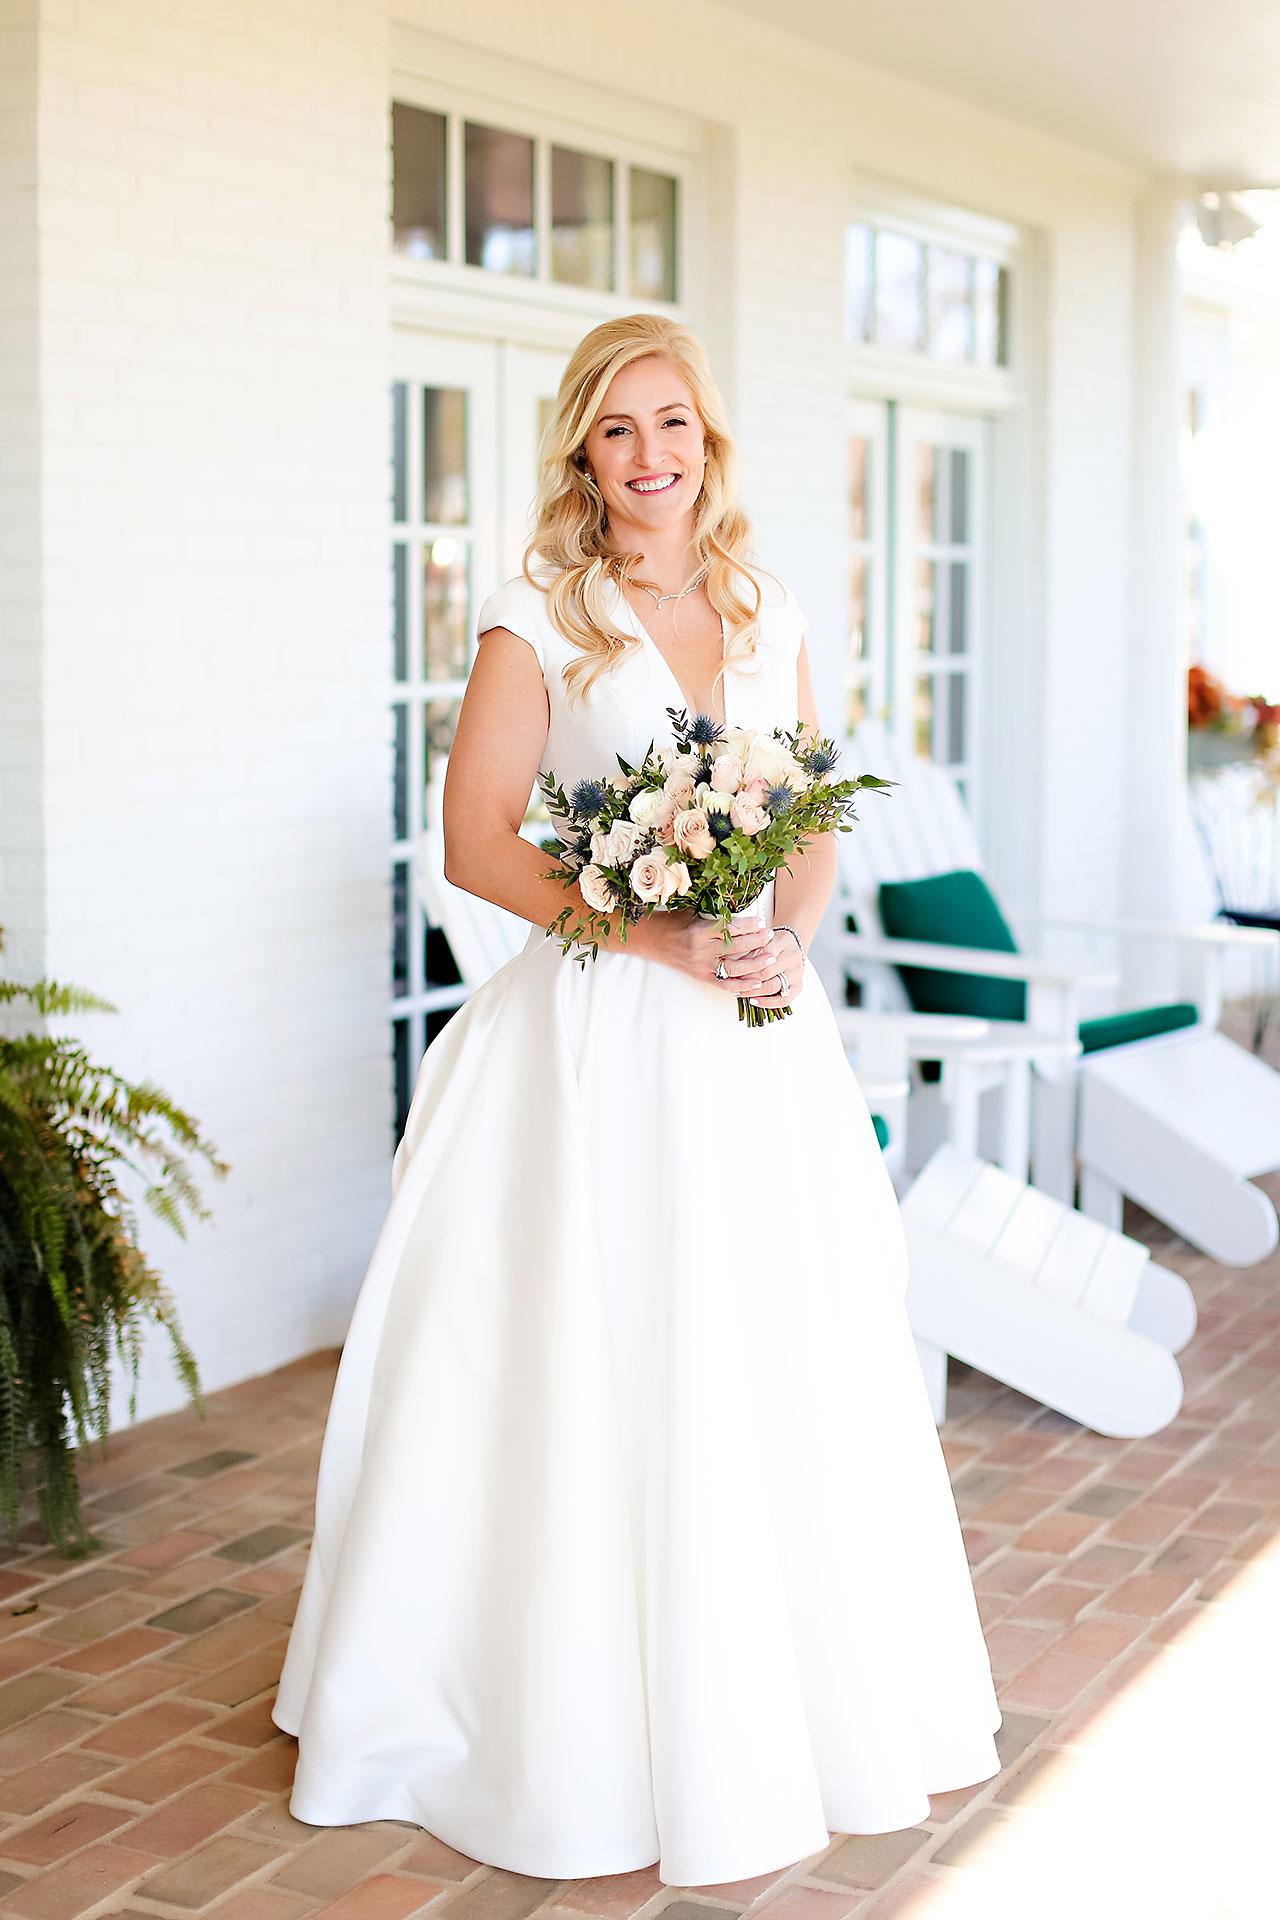 Ashley Steve Bloomington Indiana Wedding 075